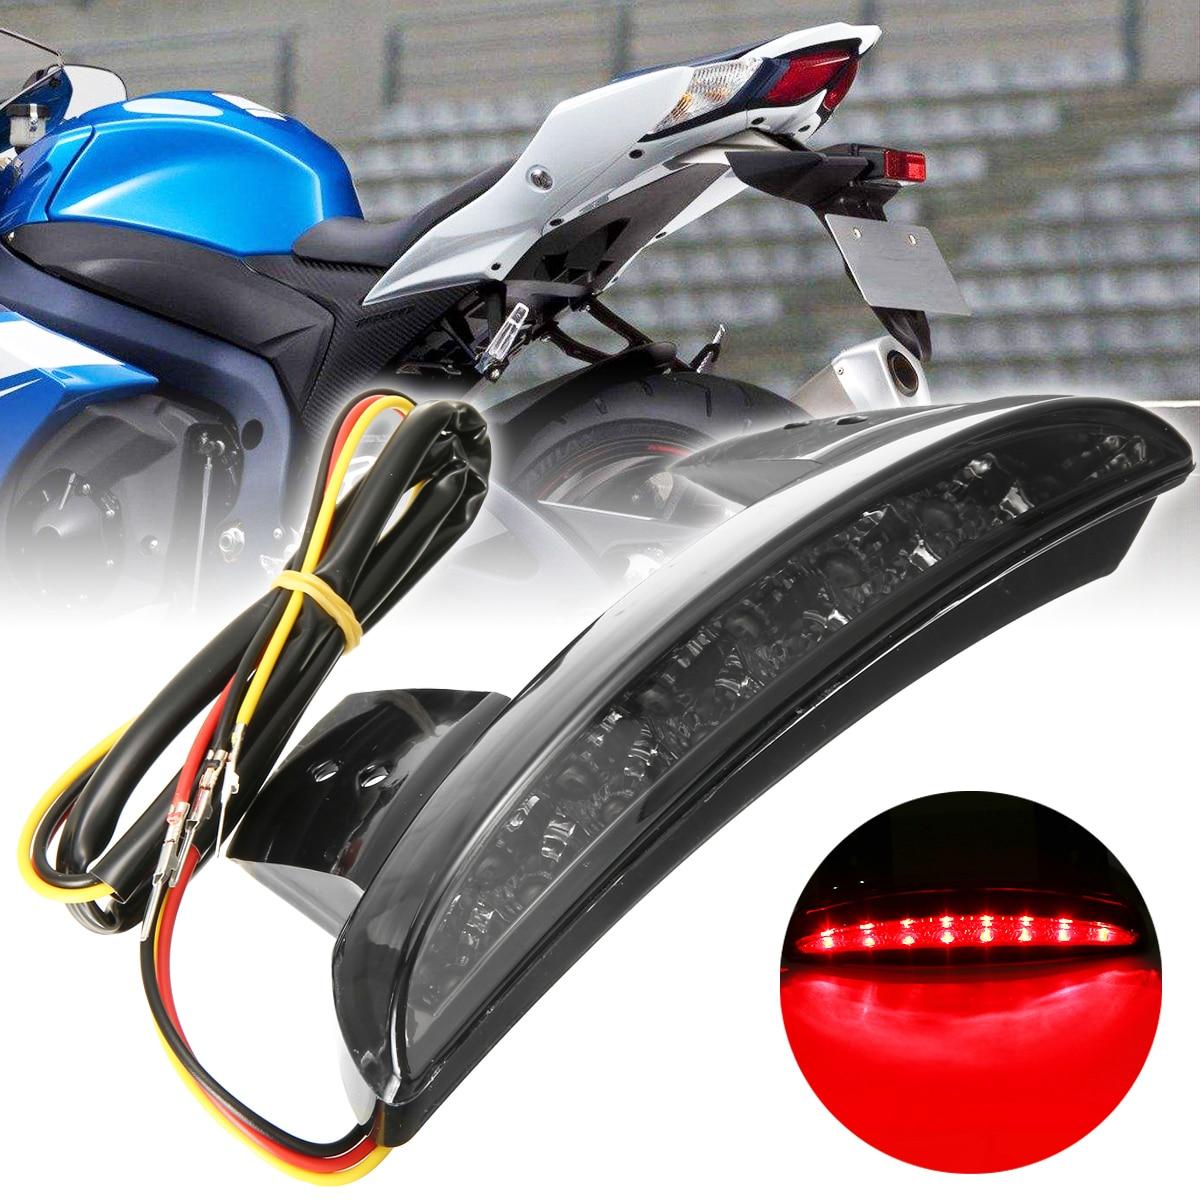 Motocicleta humo rojo freno trasero luz picada guardabarros borde LED lámpara para h-arley d-avidson XL883N XL1200N XL1200V XL1200X